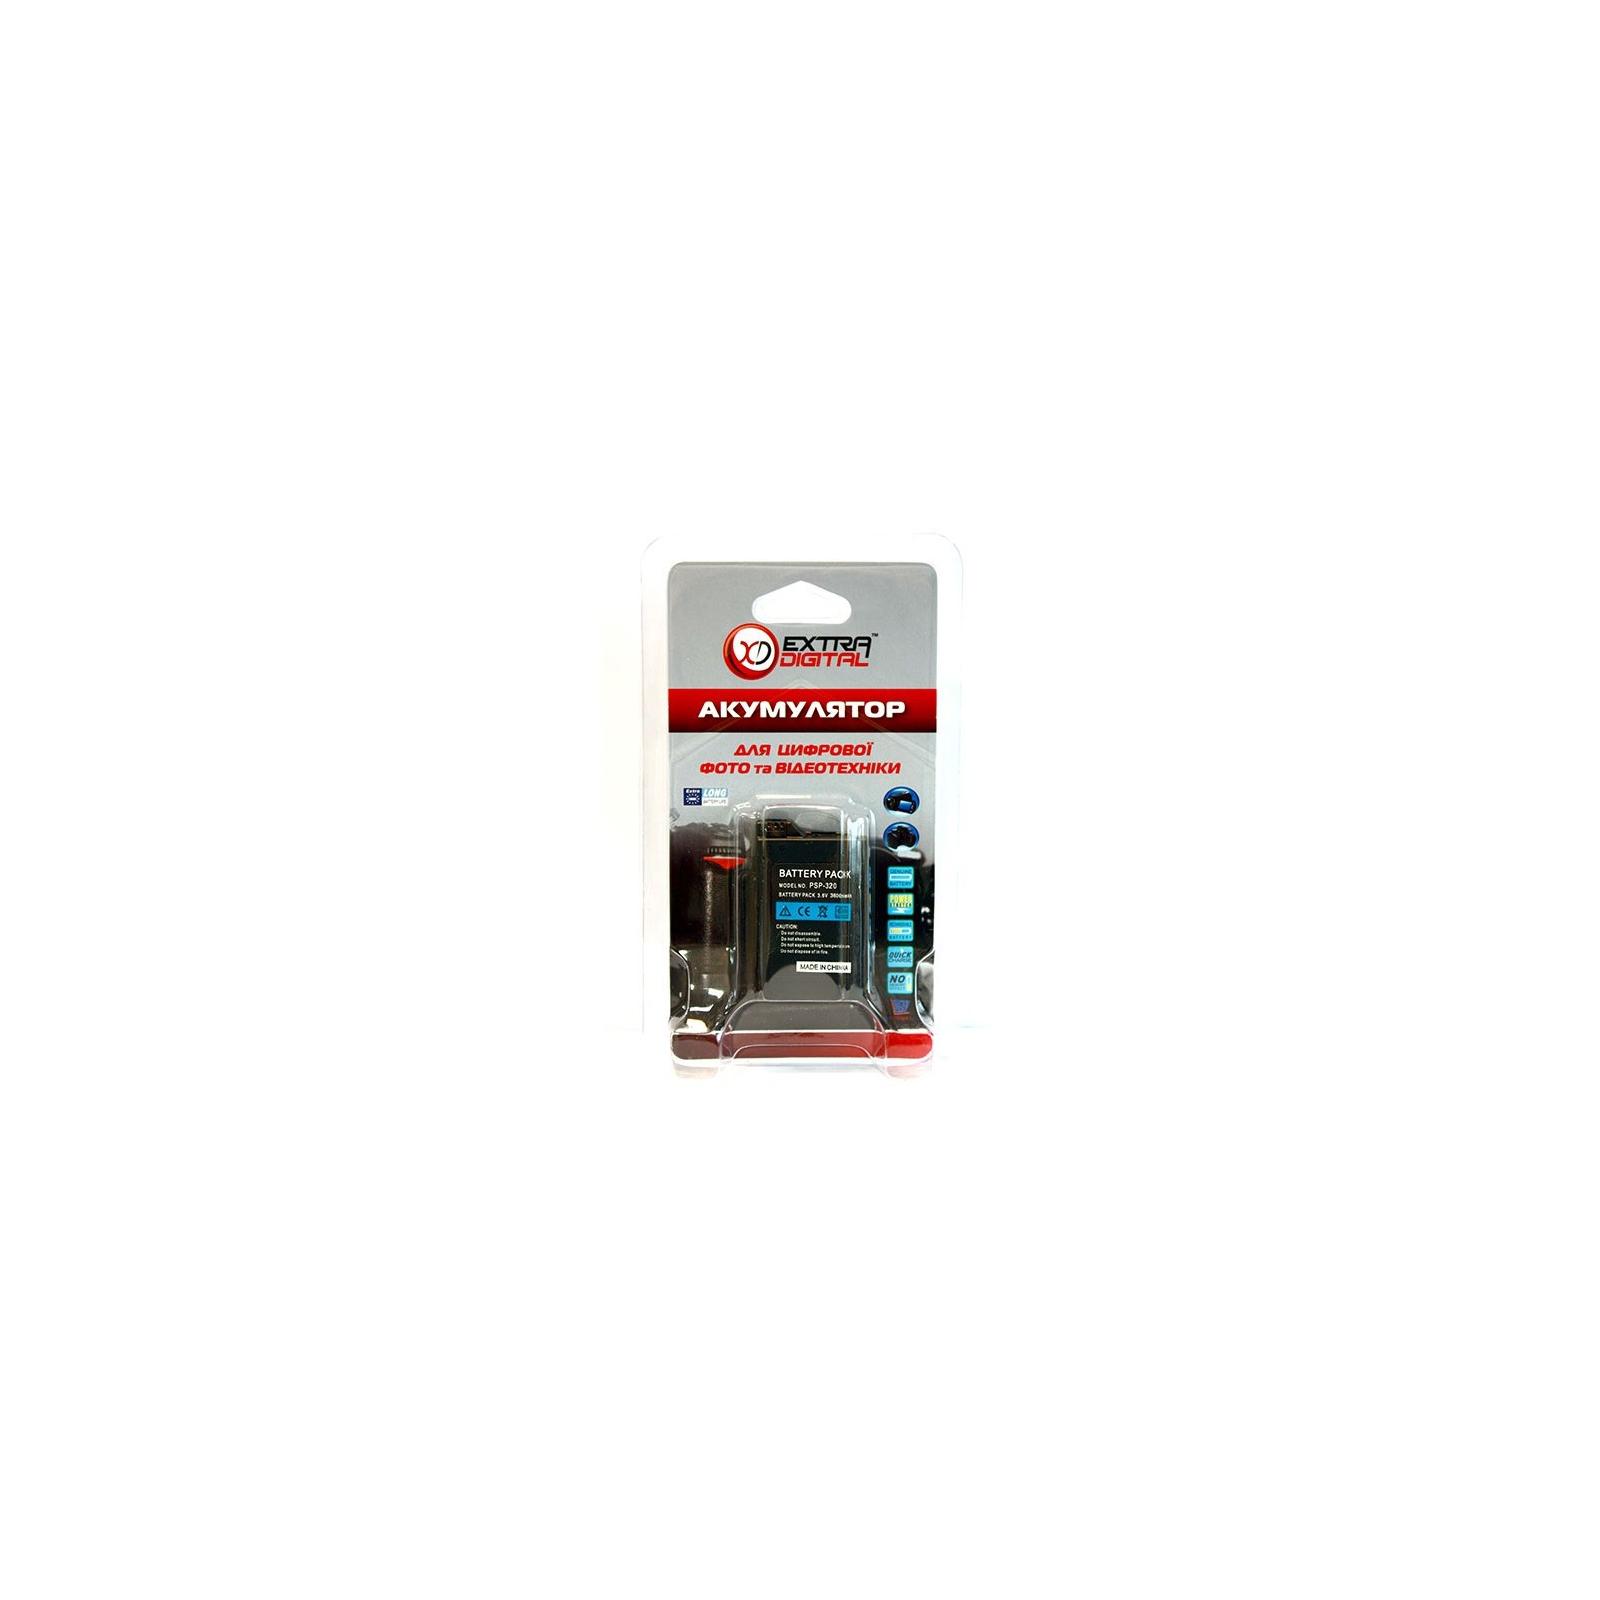 Аккумулятор к фото/видео EXTRADIGITAL Sony PSP-110 (DV00DV1351) изображение 4